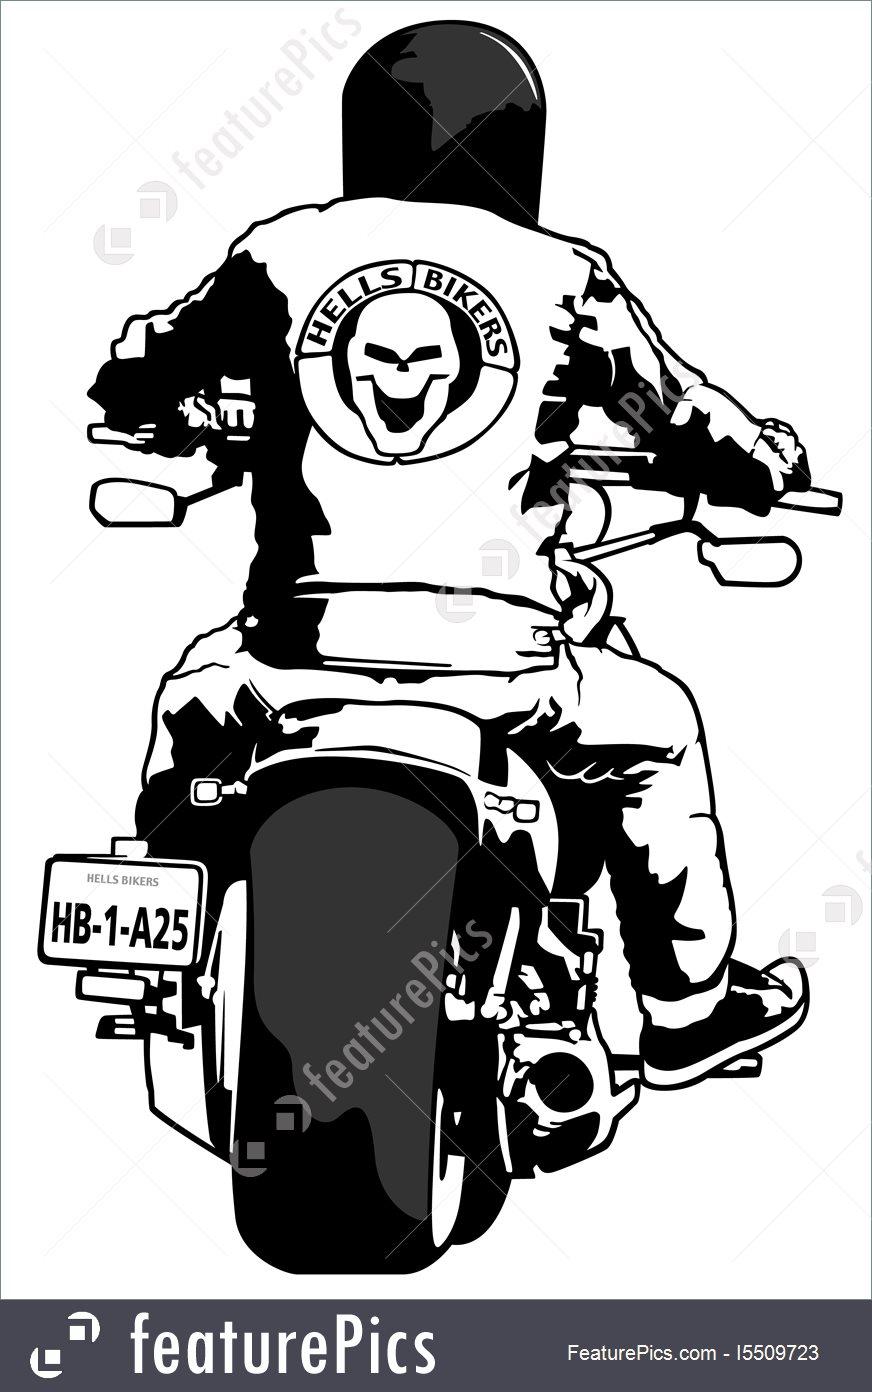 872x1392 Illustration Of Harley Davidson And Rider